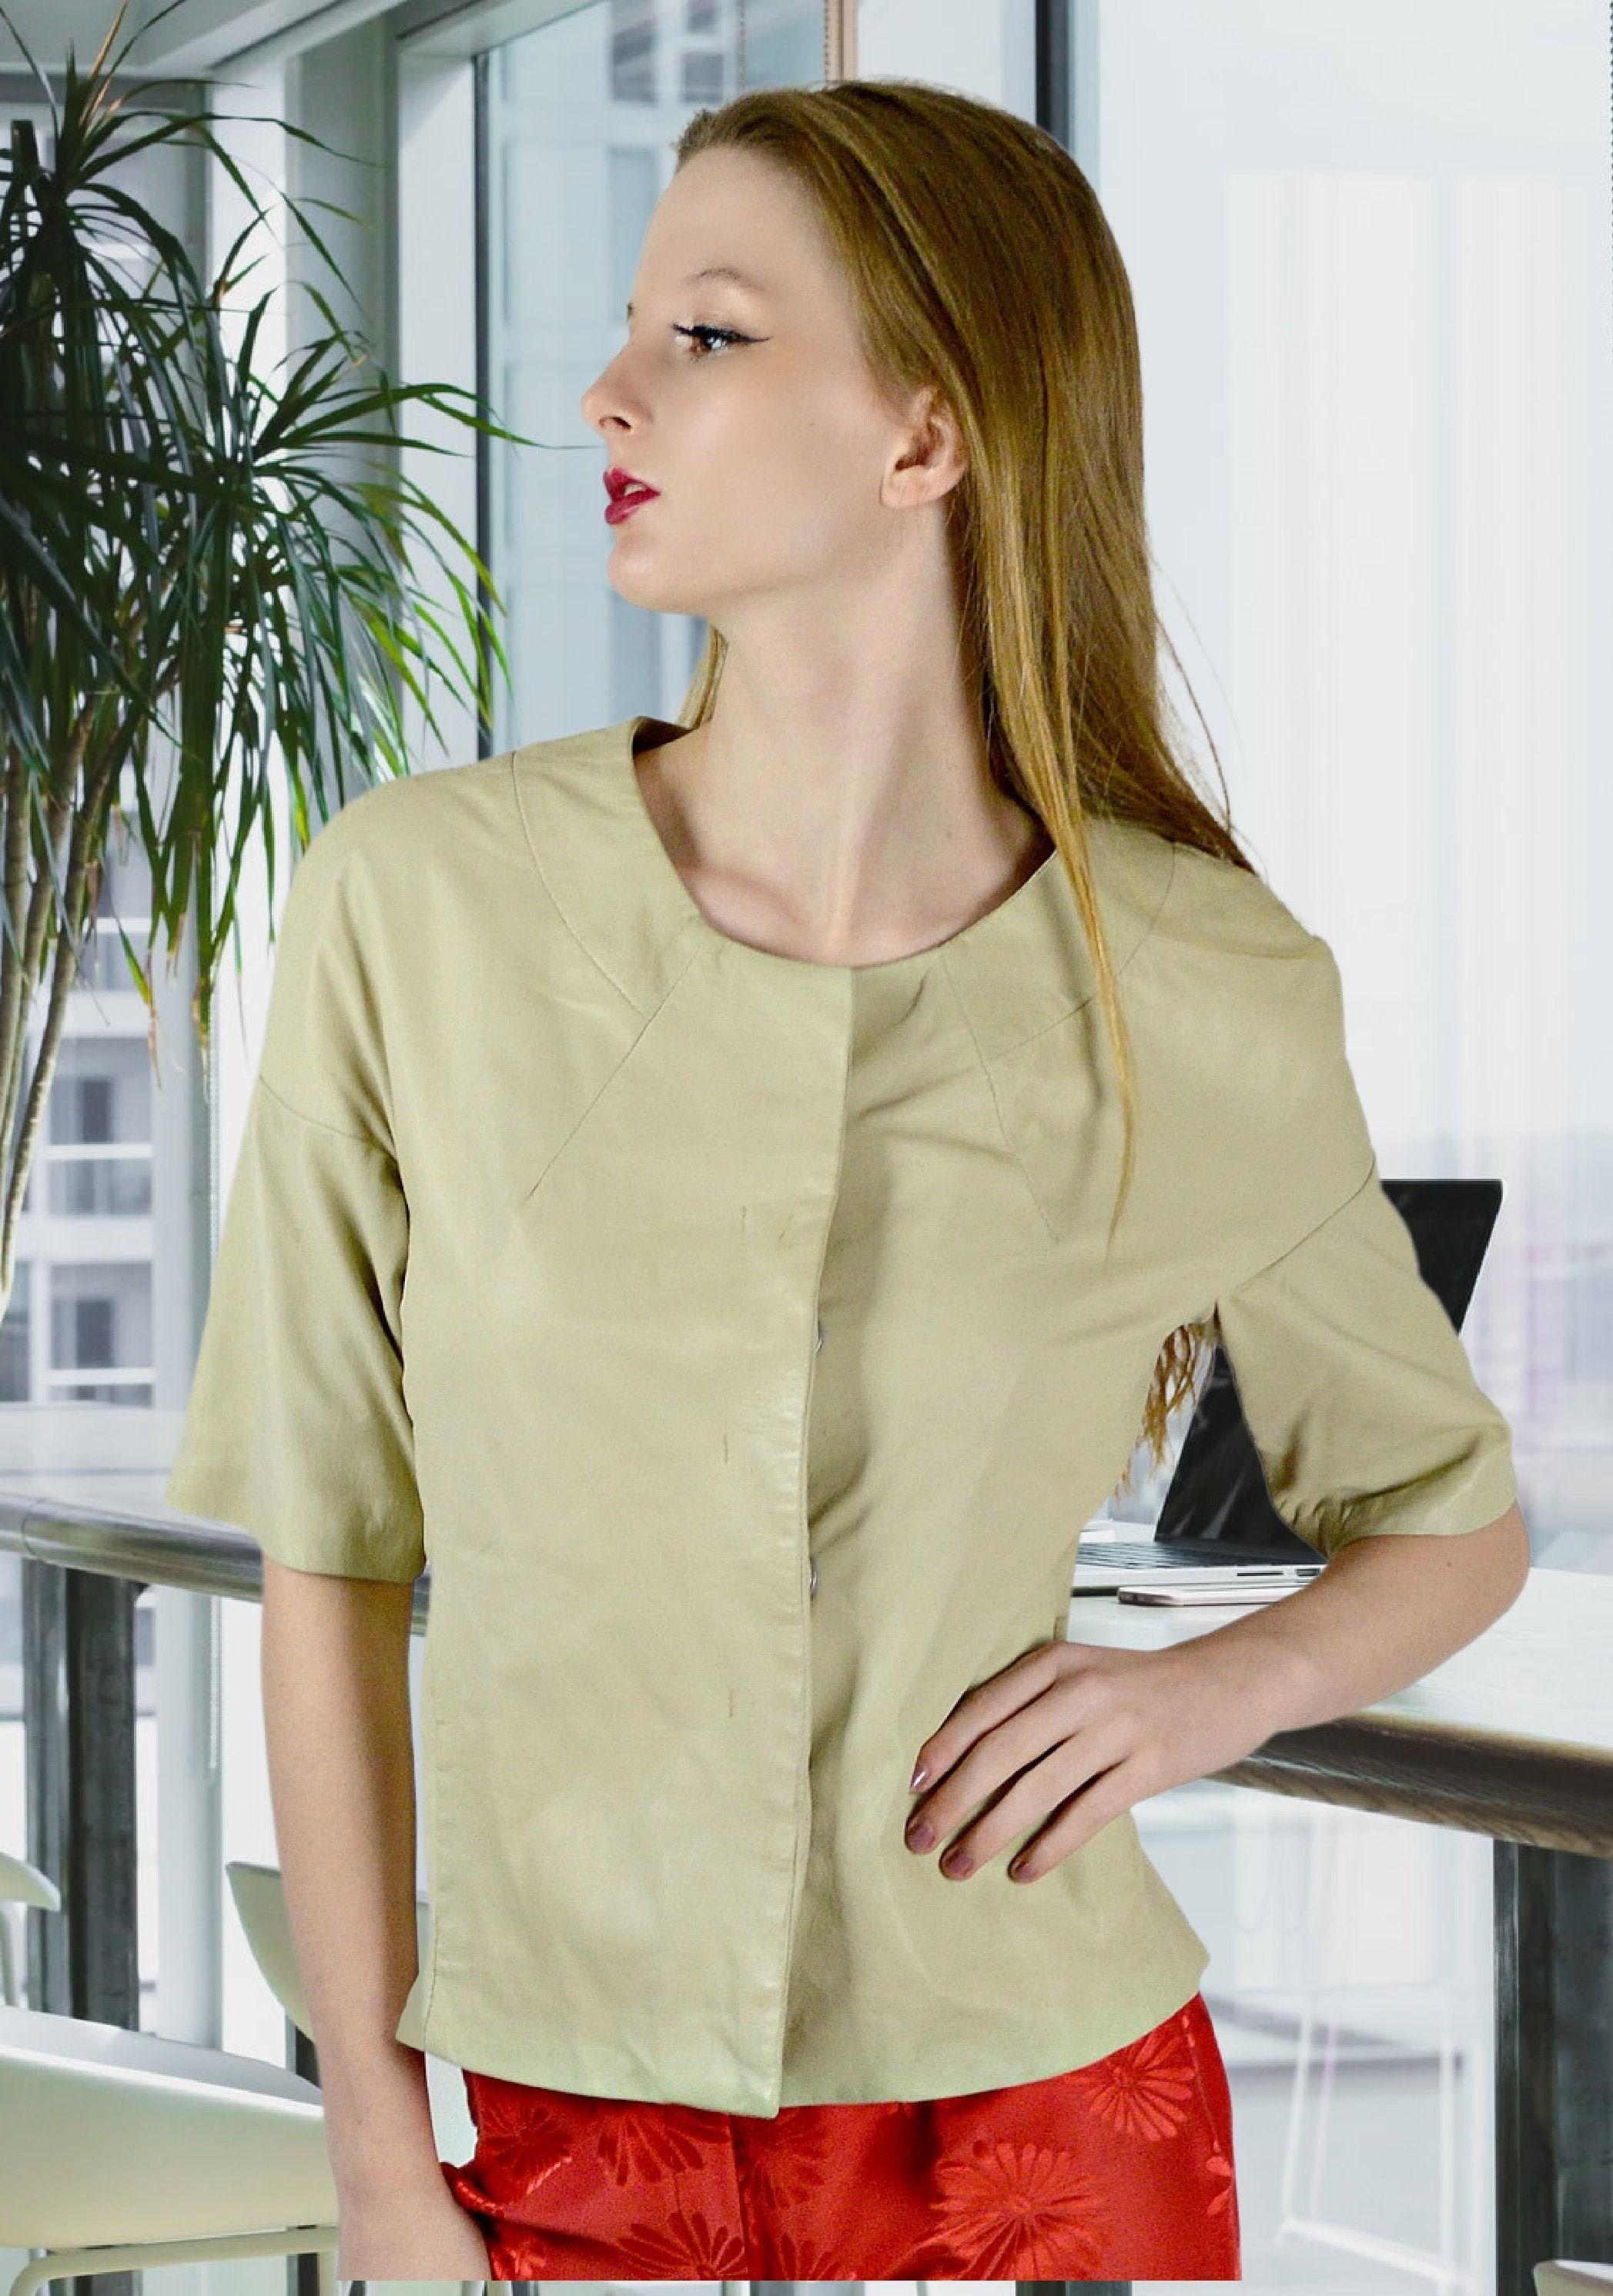 Vintage Scarf Styles -1920s to 1960s Short Sleeved Leather Top, Vintage Kid Skin Blouse, Modern Minimalist Shirt, 90S Beige Everyday Chic Work Top $73.80 AT vintagedancer.com